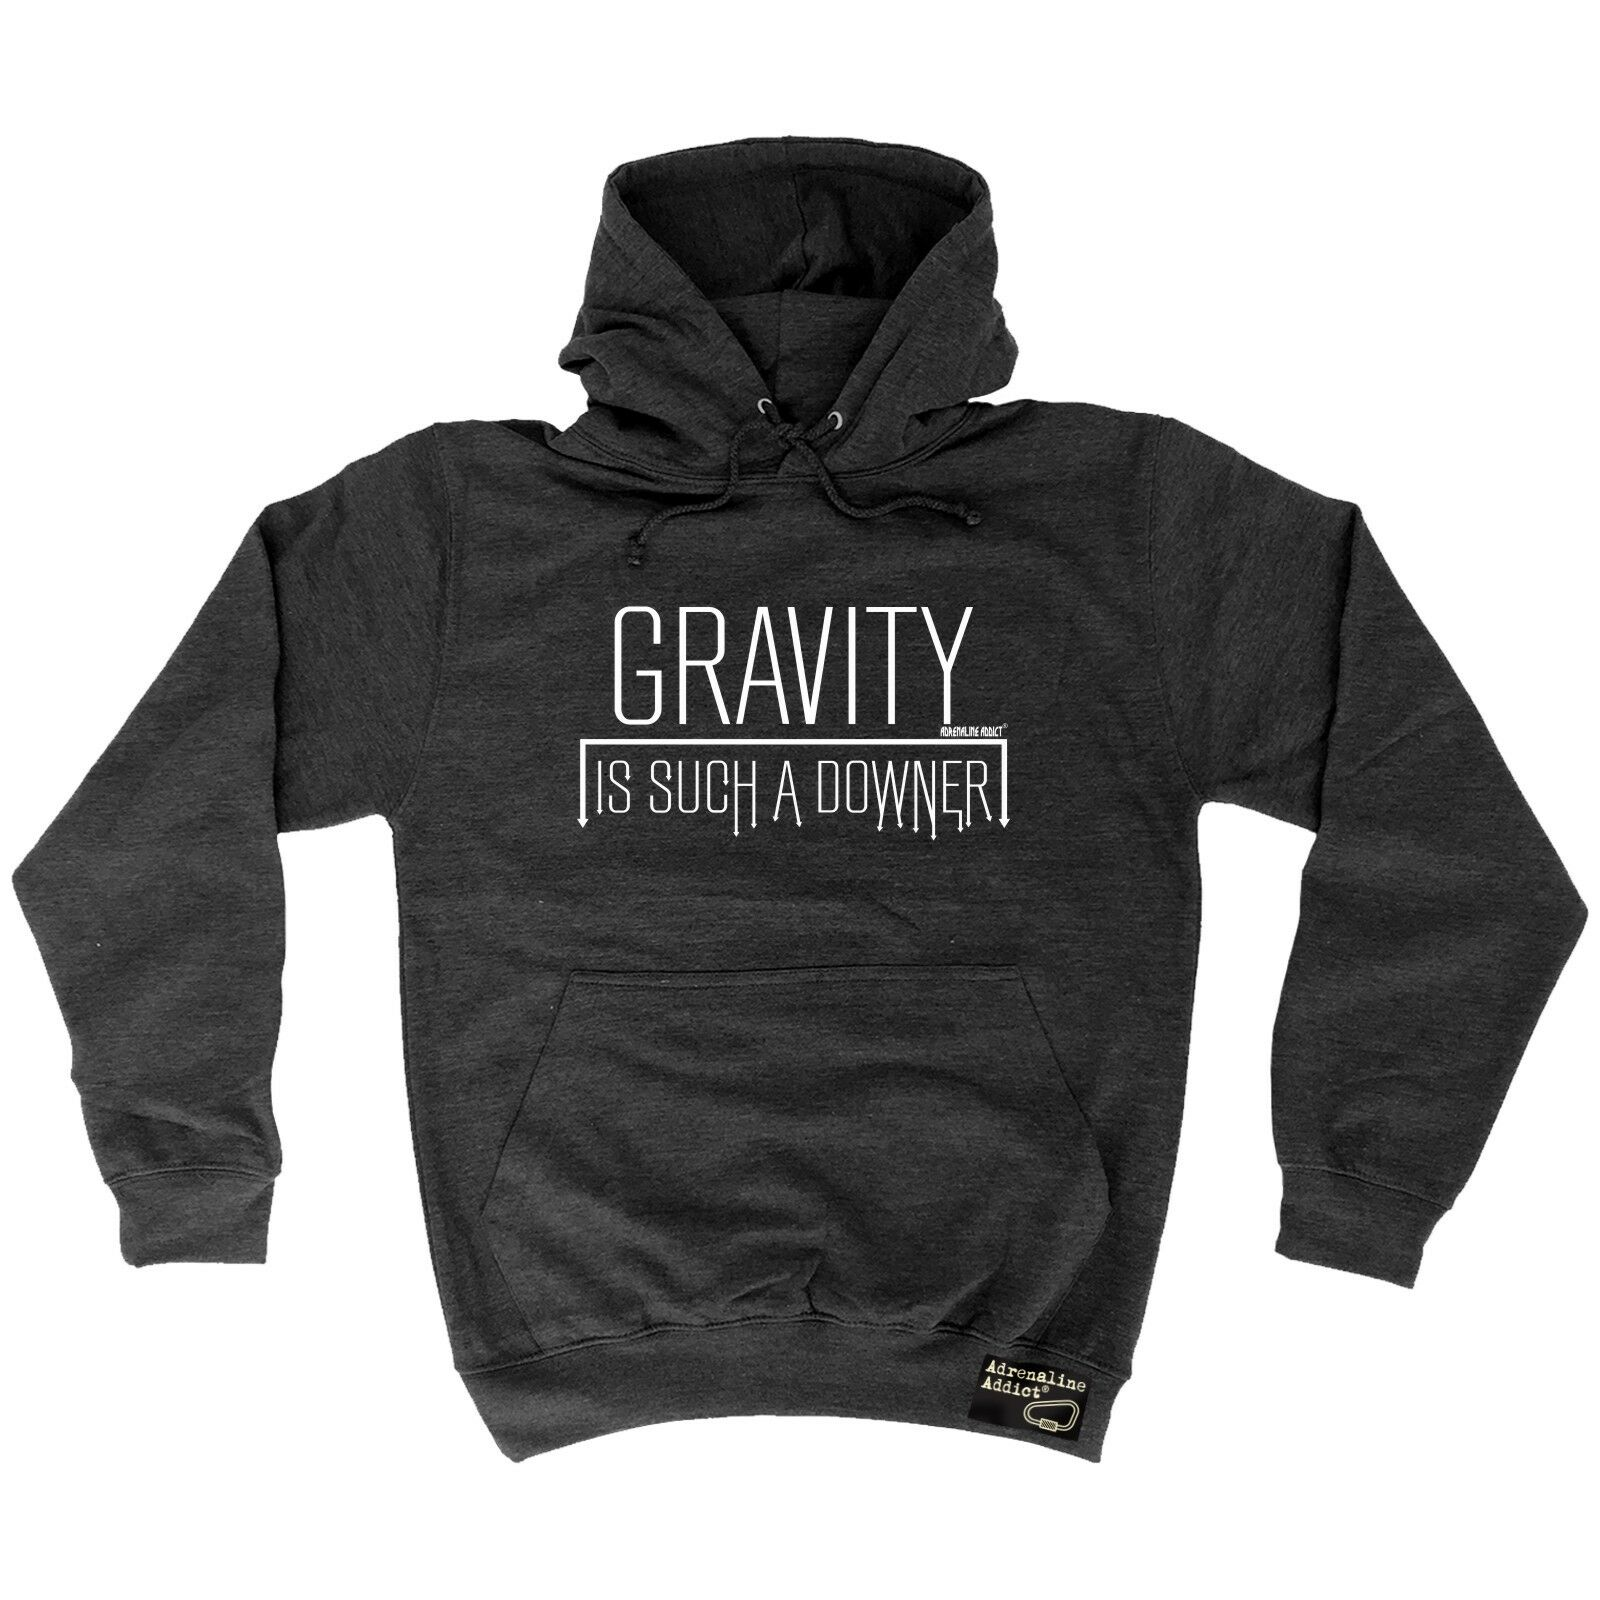 Climbing Hoodie Gravity Is A Downer hoody bouldering funny Birthdaysports HOODY